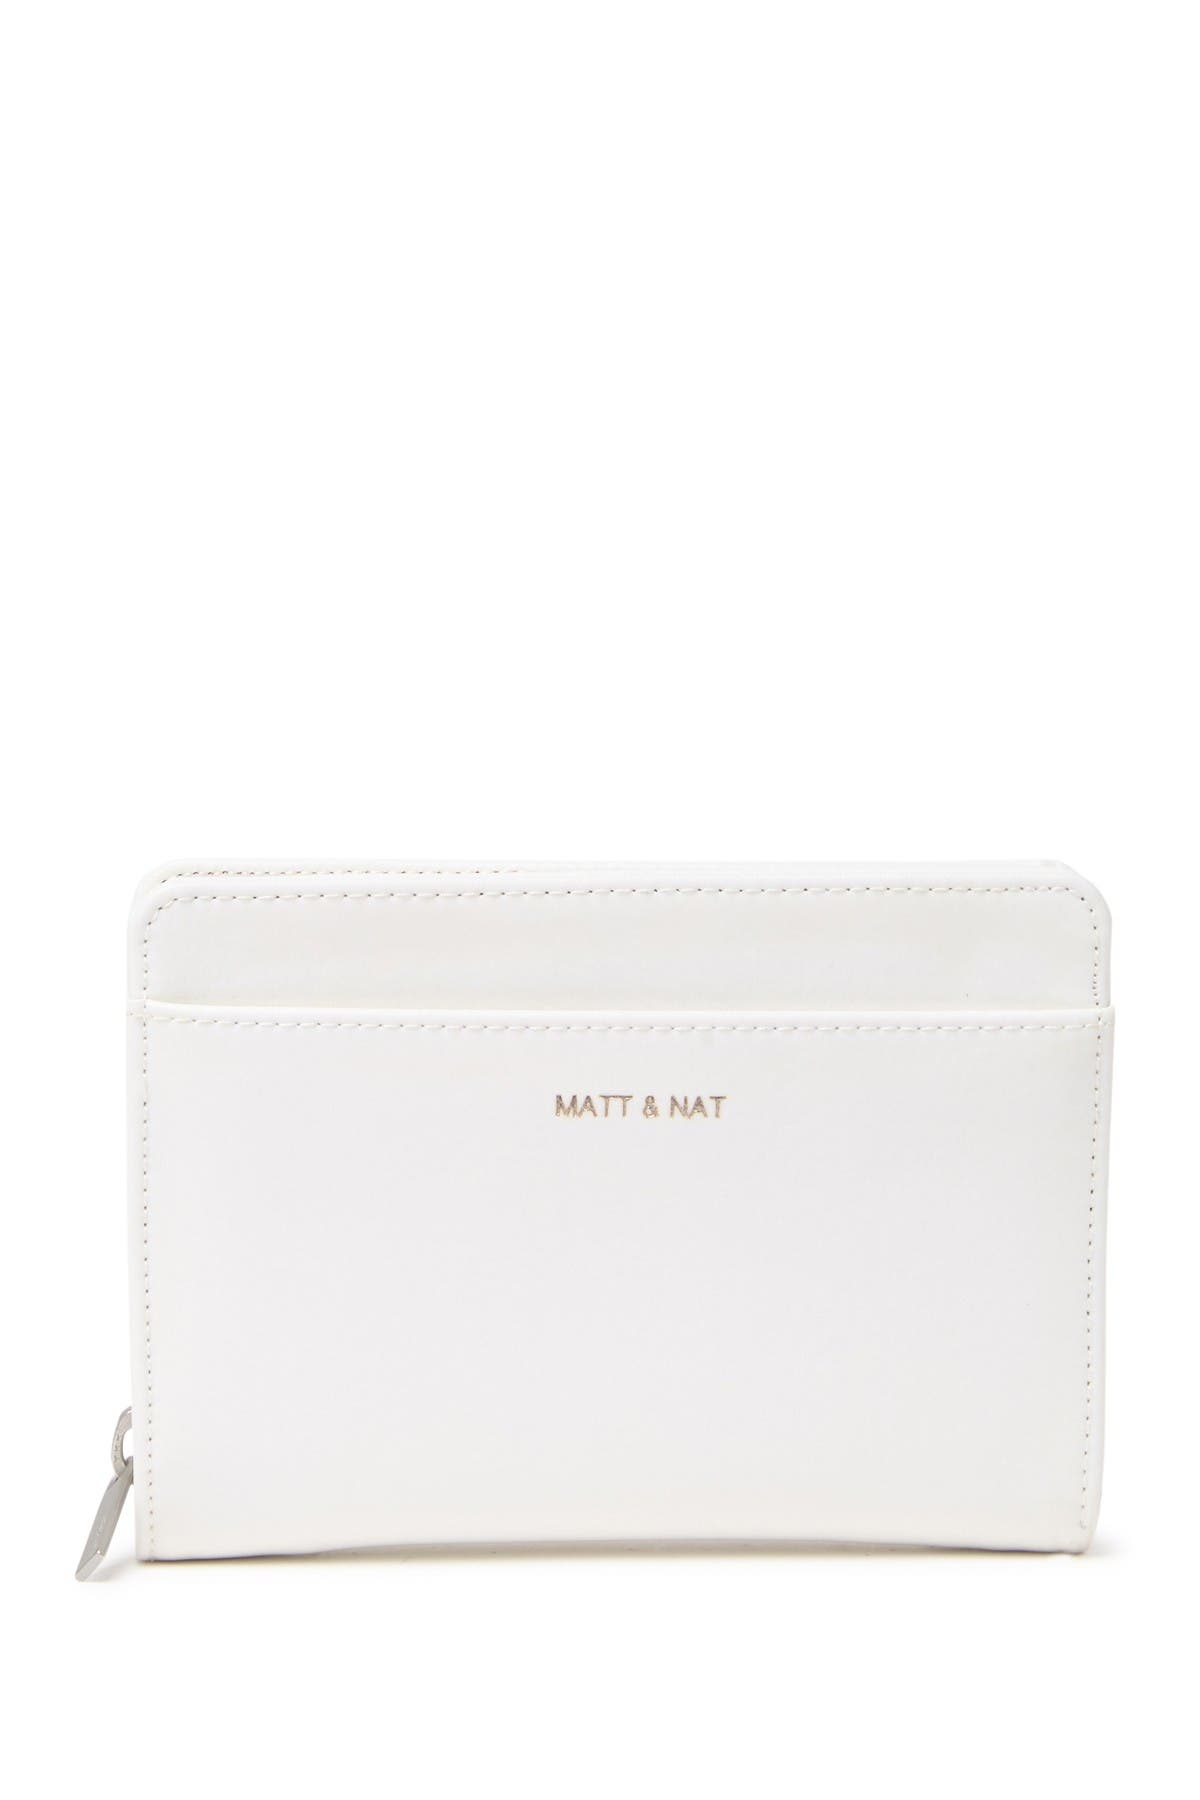 Image of Matt & Nat Webber Vegan Leather Small Zip Wallet + Card Case